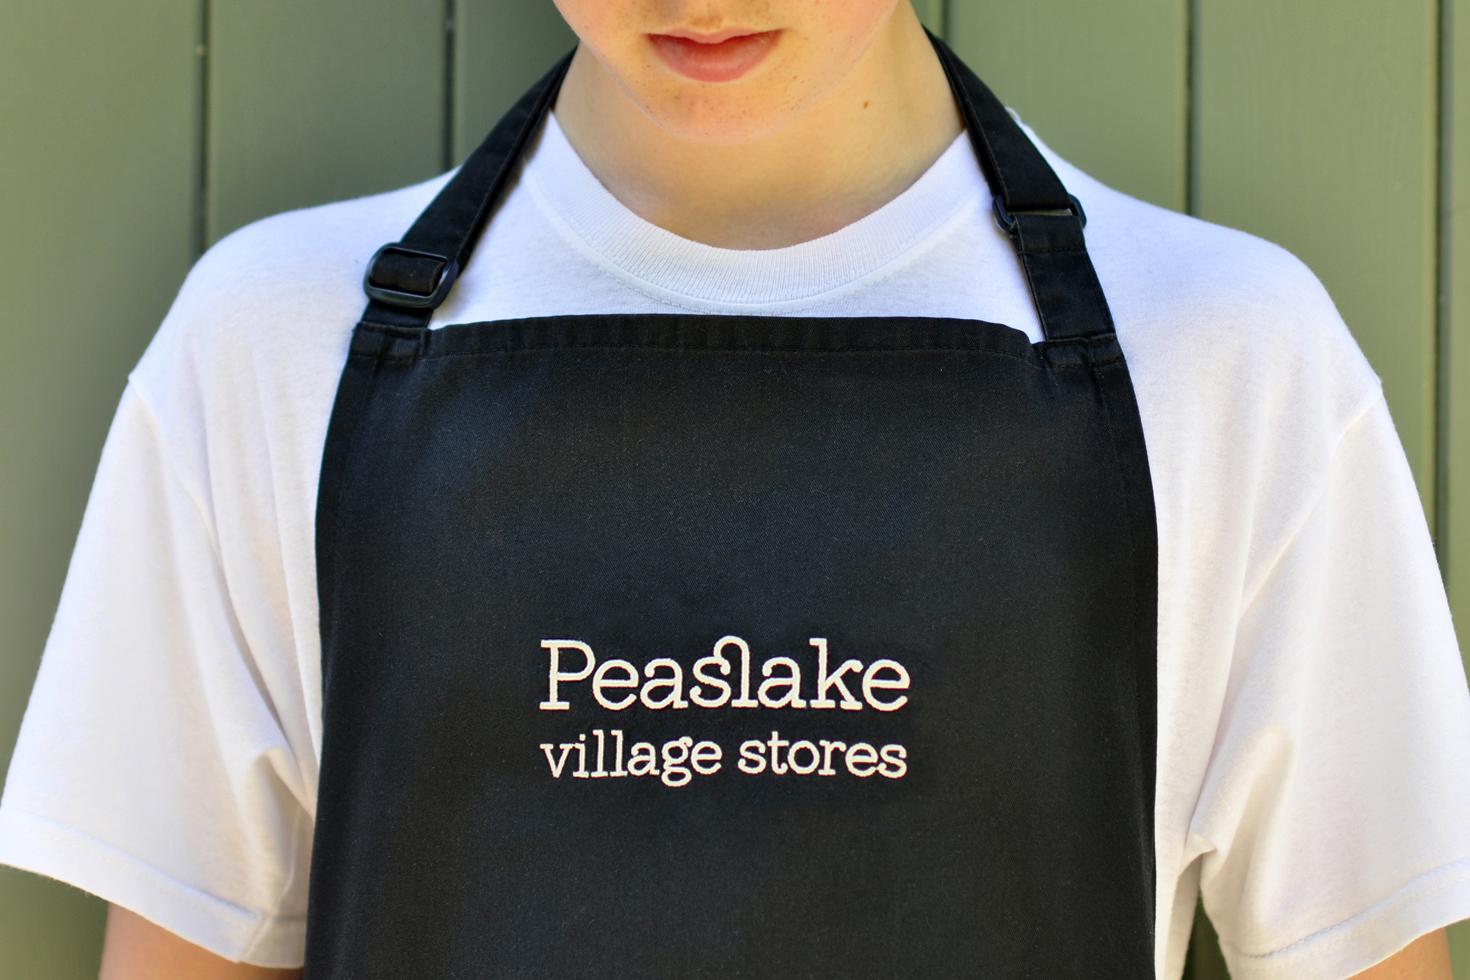 logo on apron